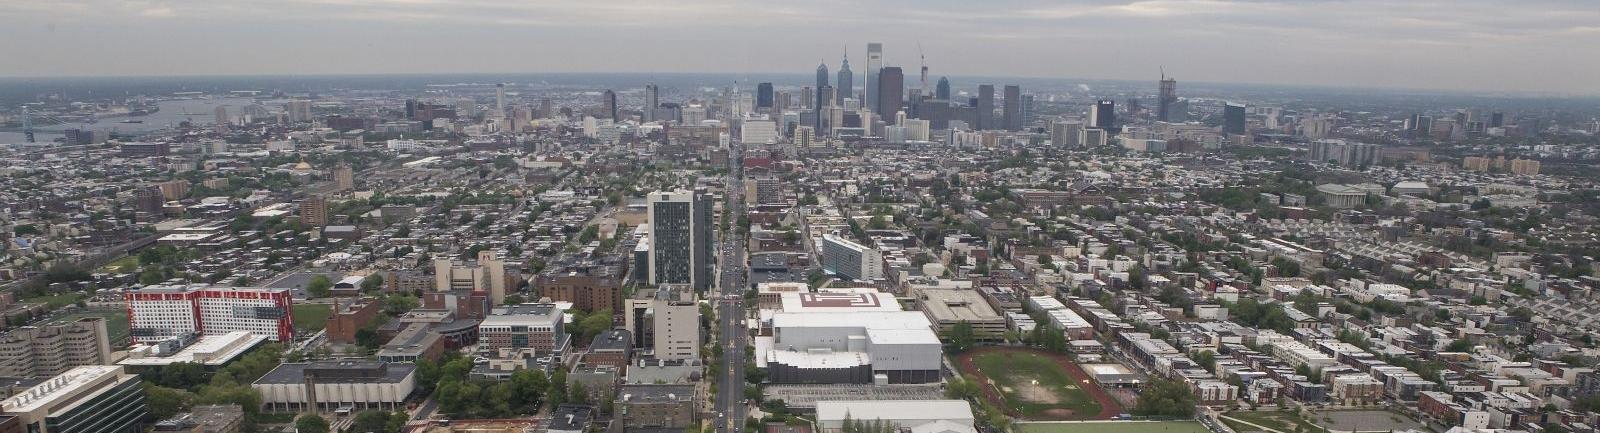 Temple Main Campus with skyline of Philadelphia